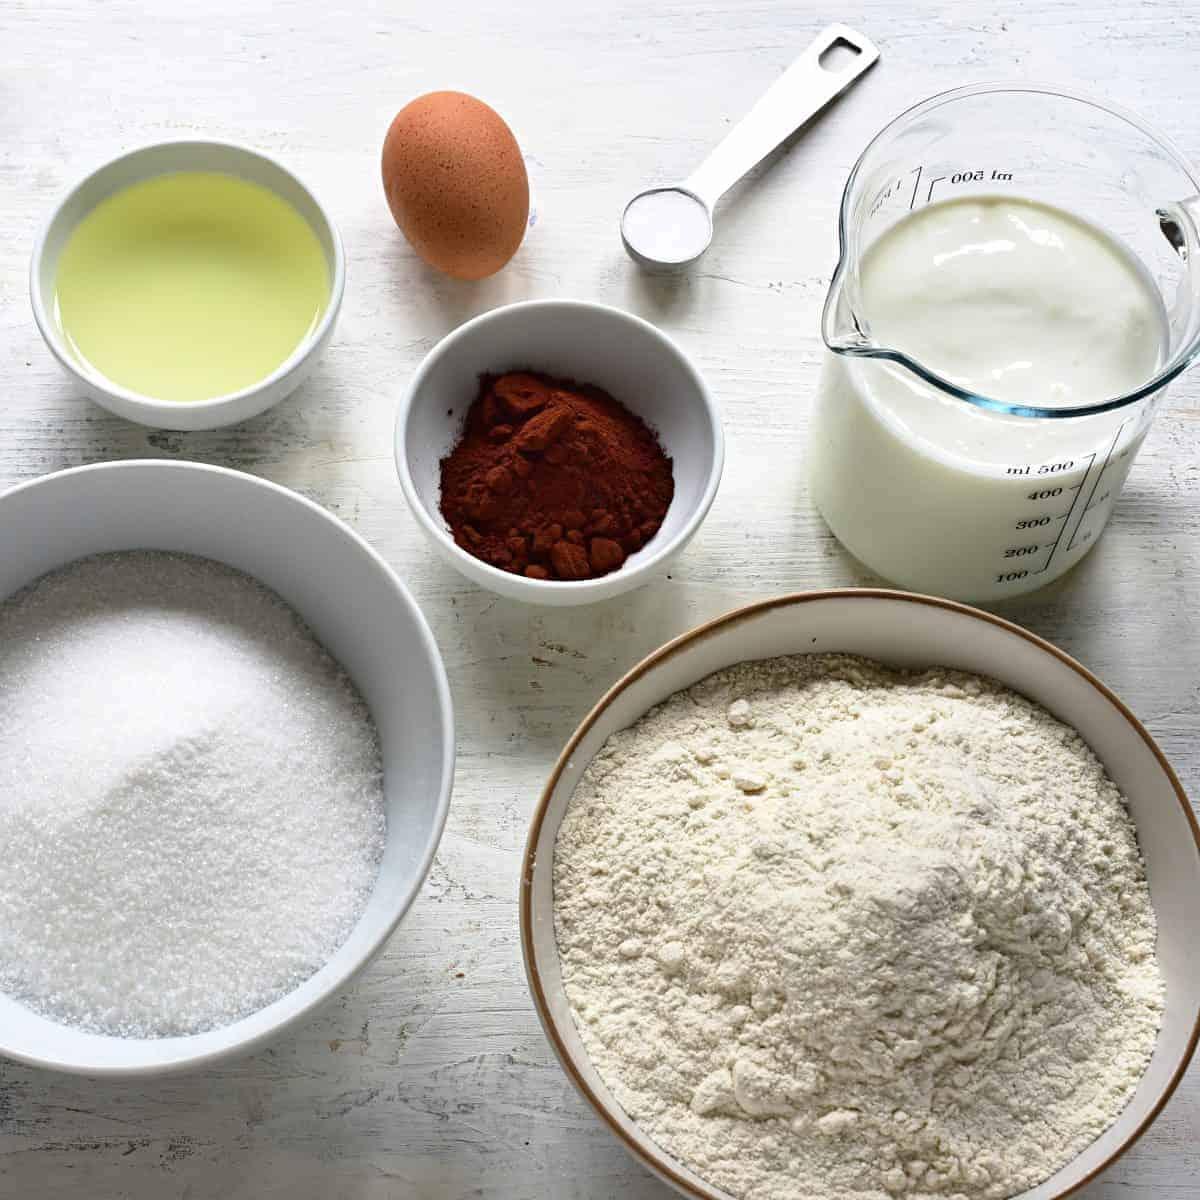 Buttermilk sheet cake ingredients.